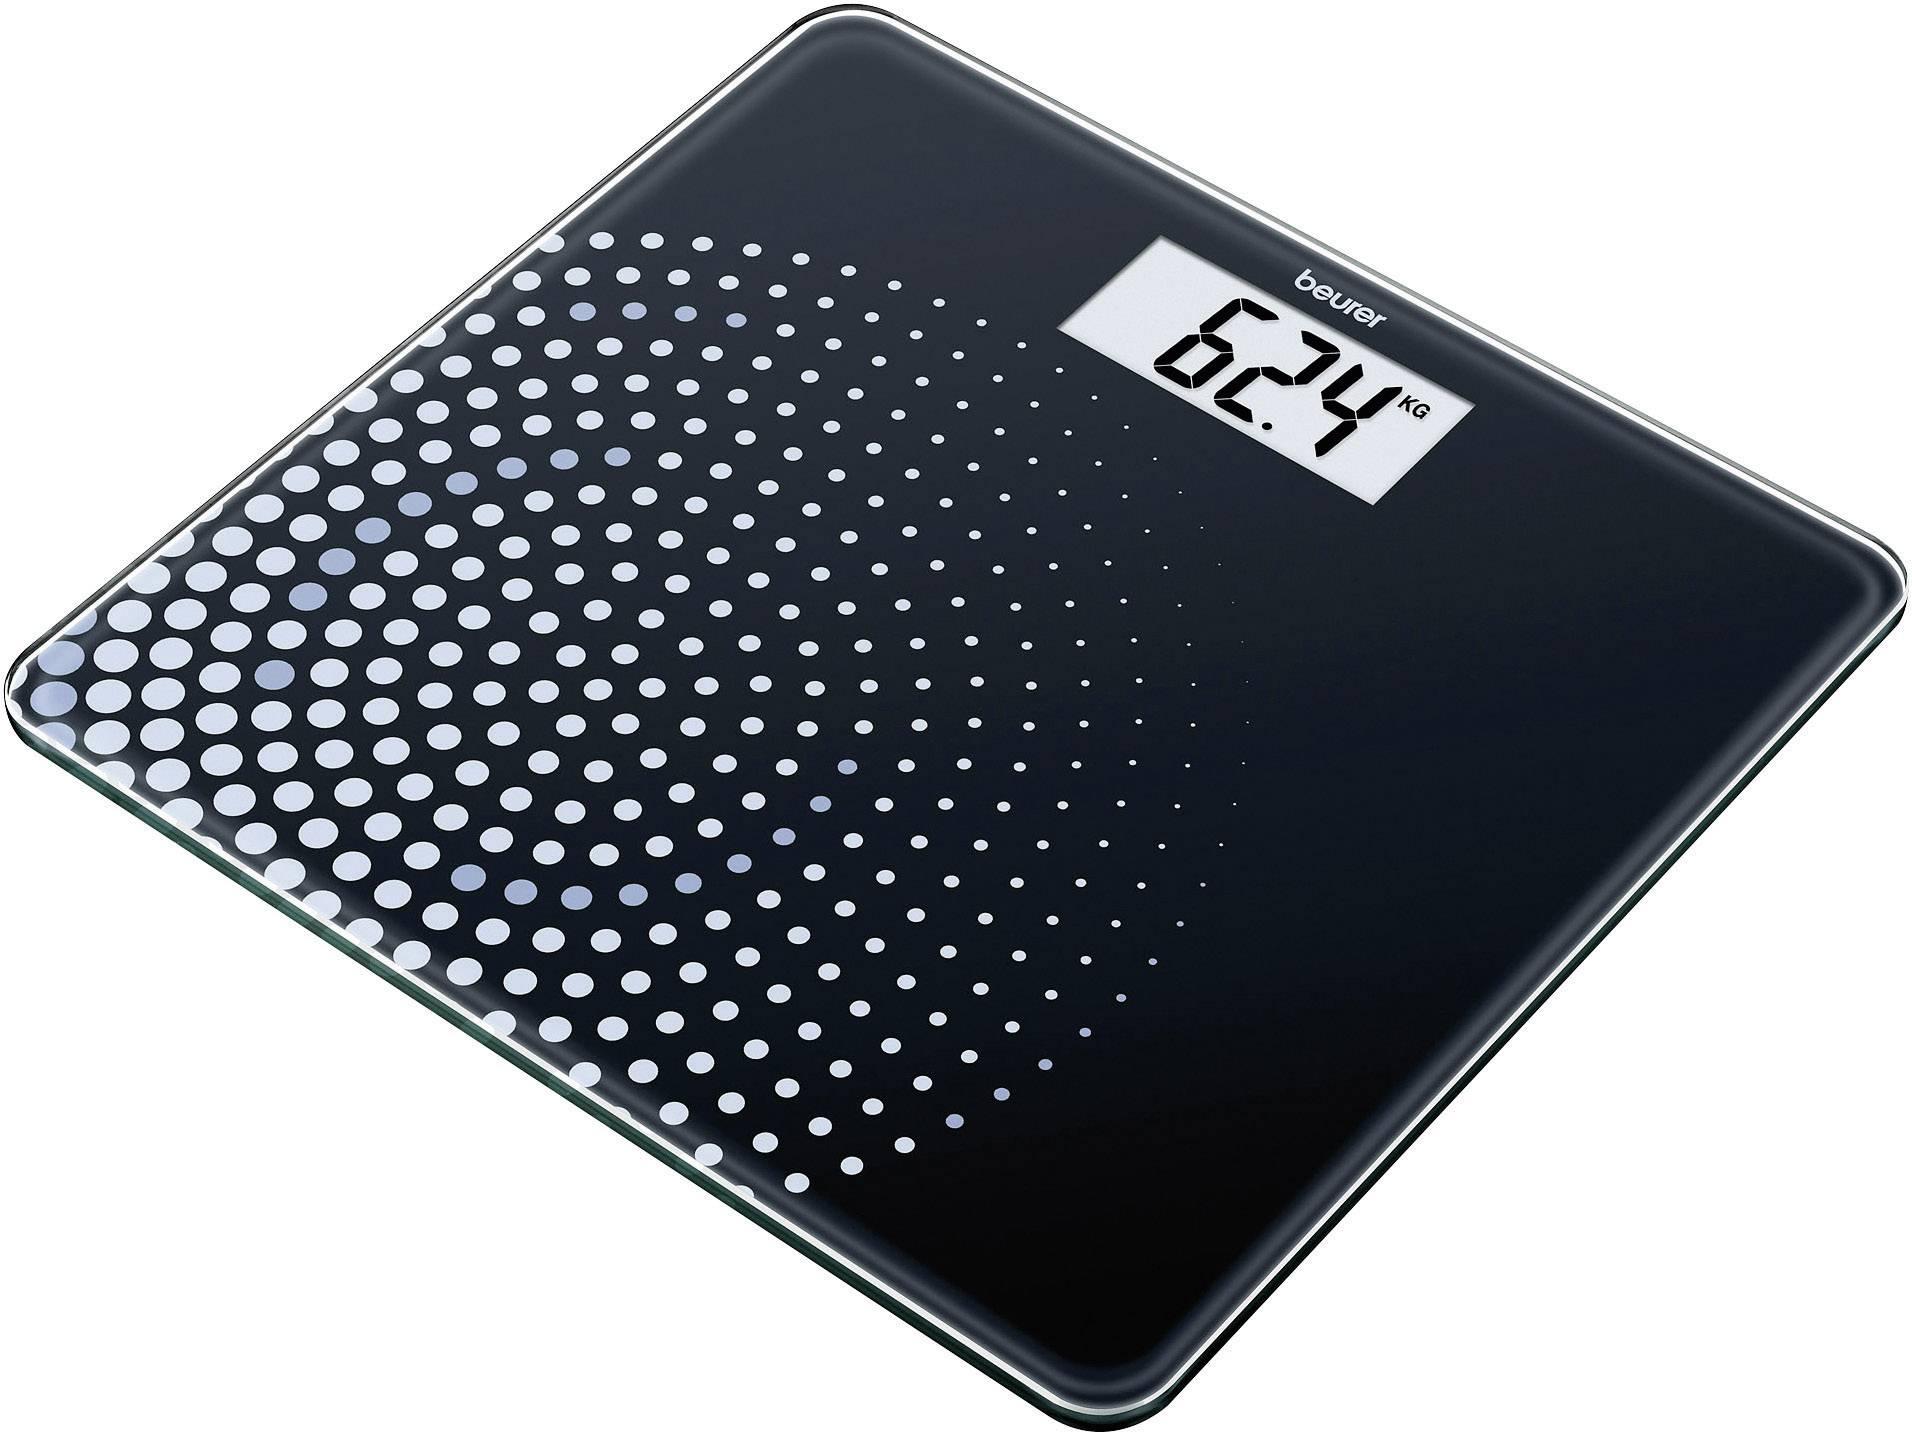 Sklenená váha Beurer GS 210